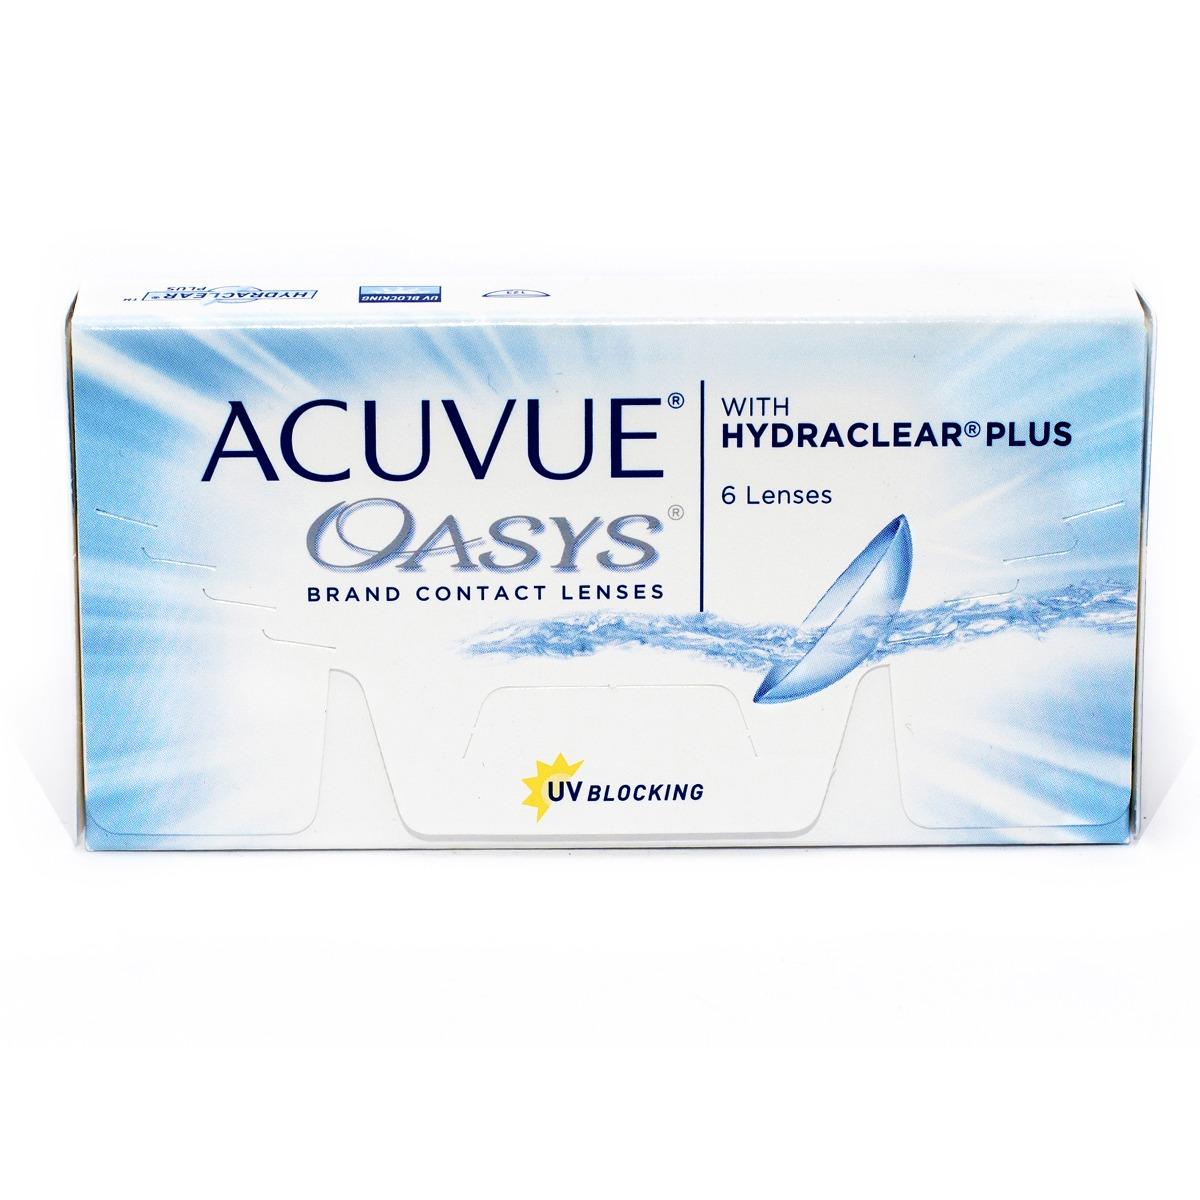 Lentes De Contato Acuvue Oasys Com Hydraclear Plus Grau-3.50 - R ... 31479706ac